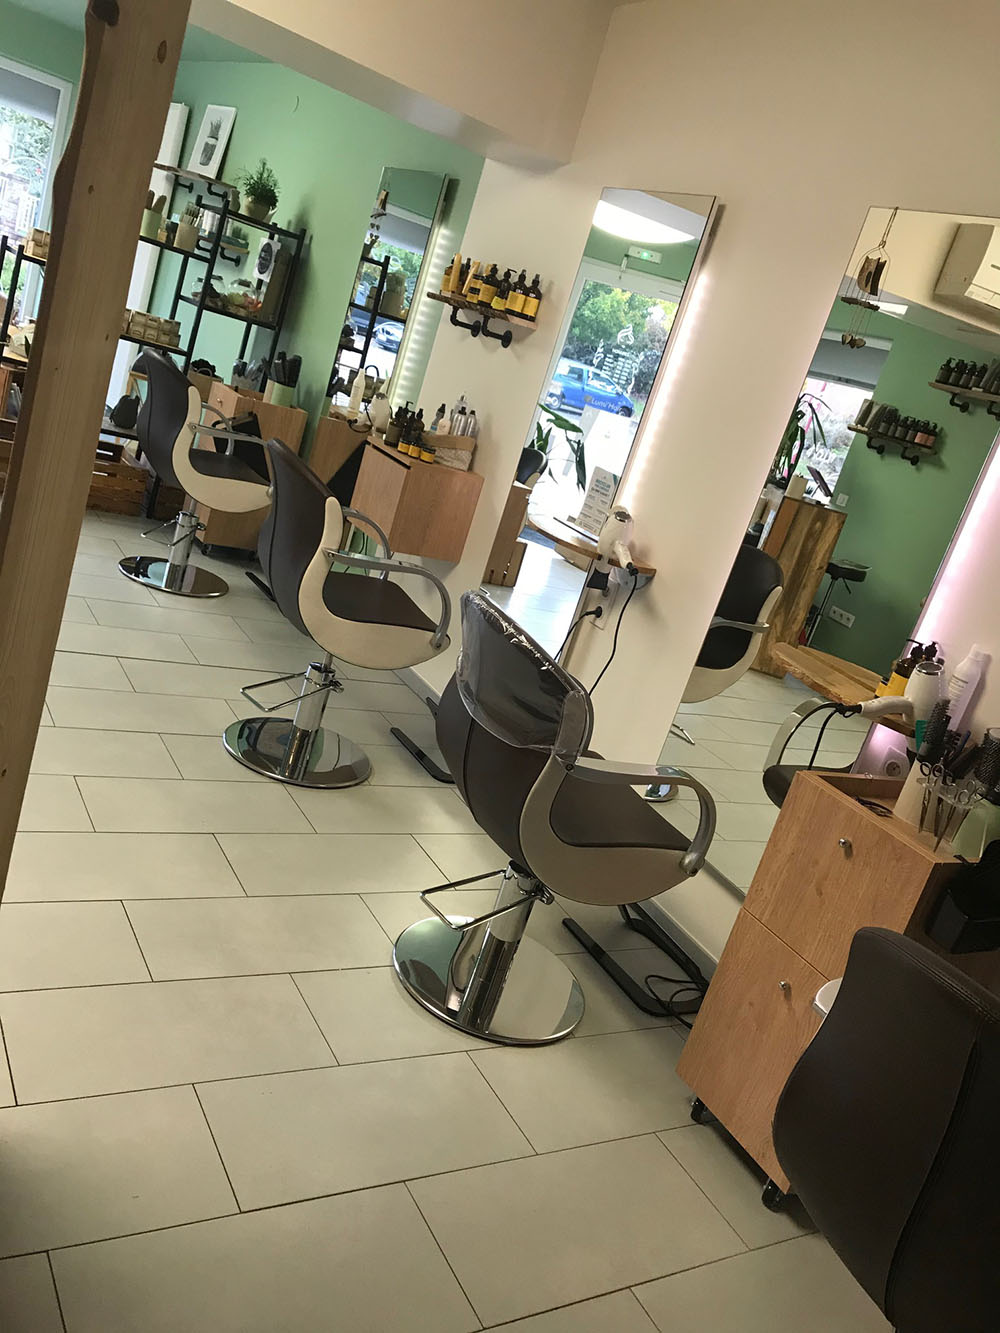 Salon de coiffure à Mertzwiller